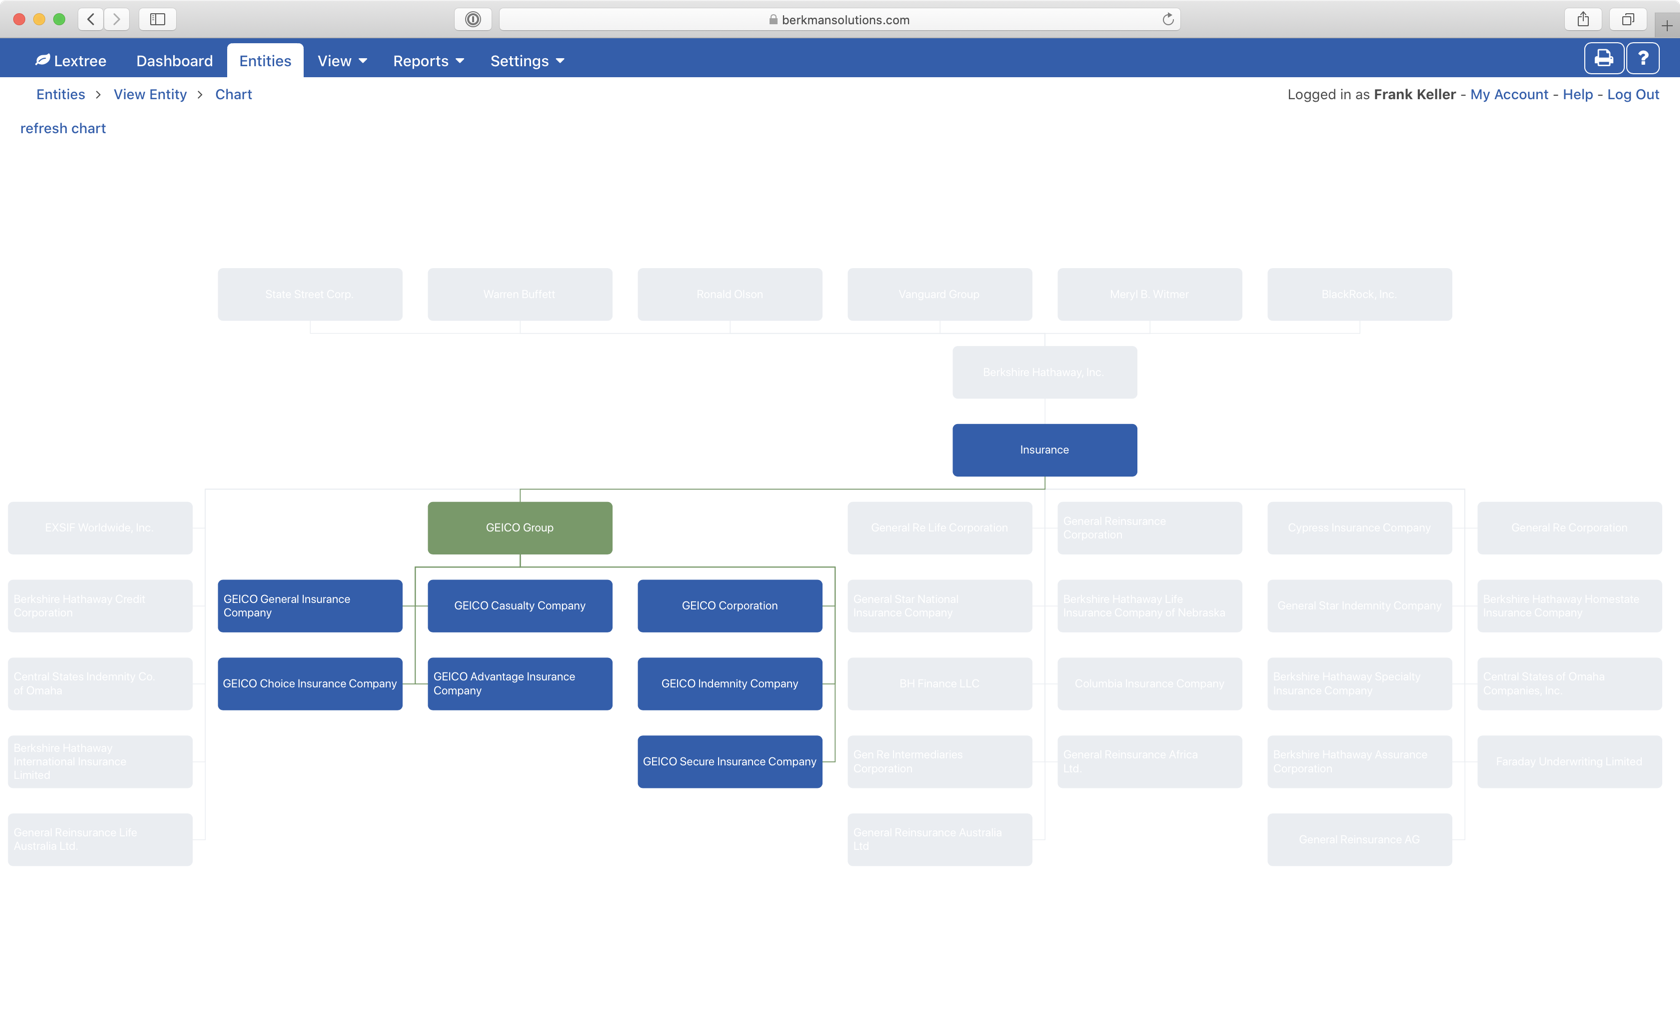 GEICO organizational chart in Insurance segment